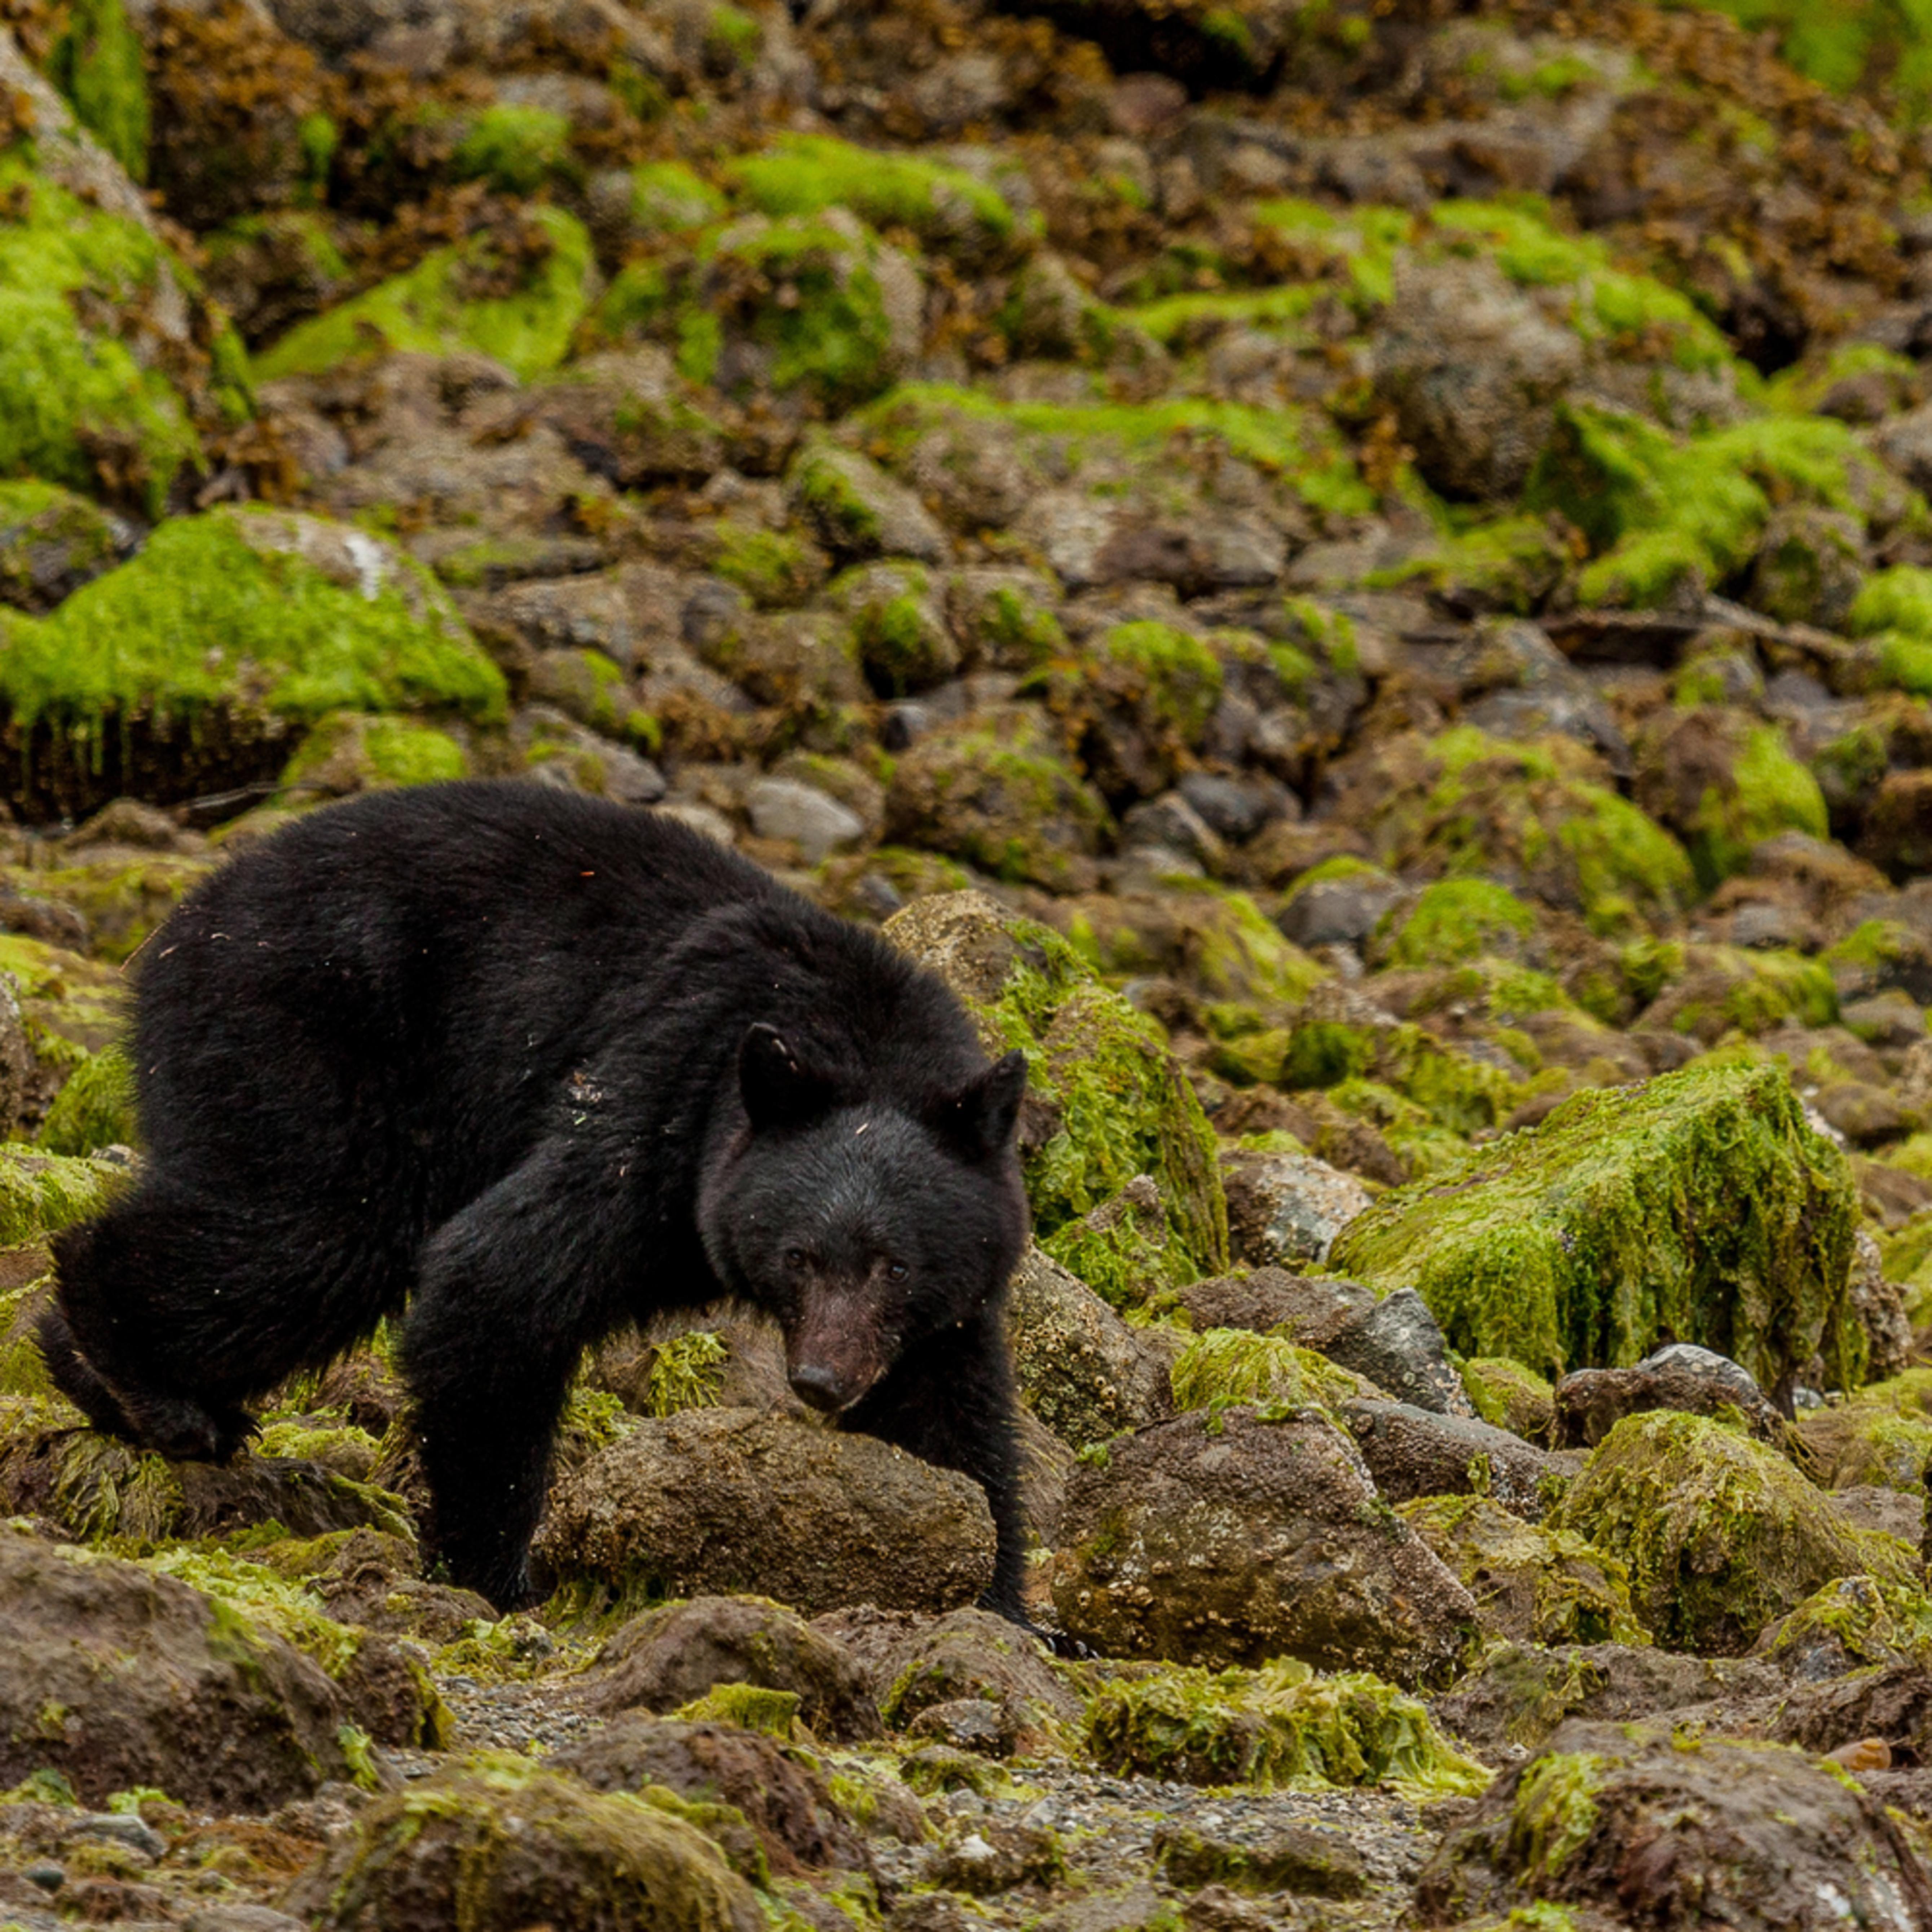 Black bear 5 bdbtjh